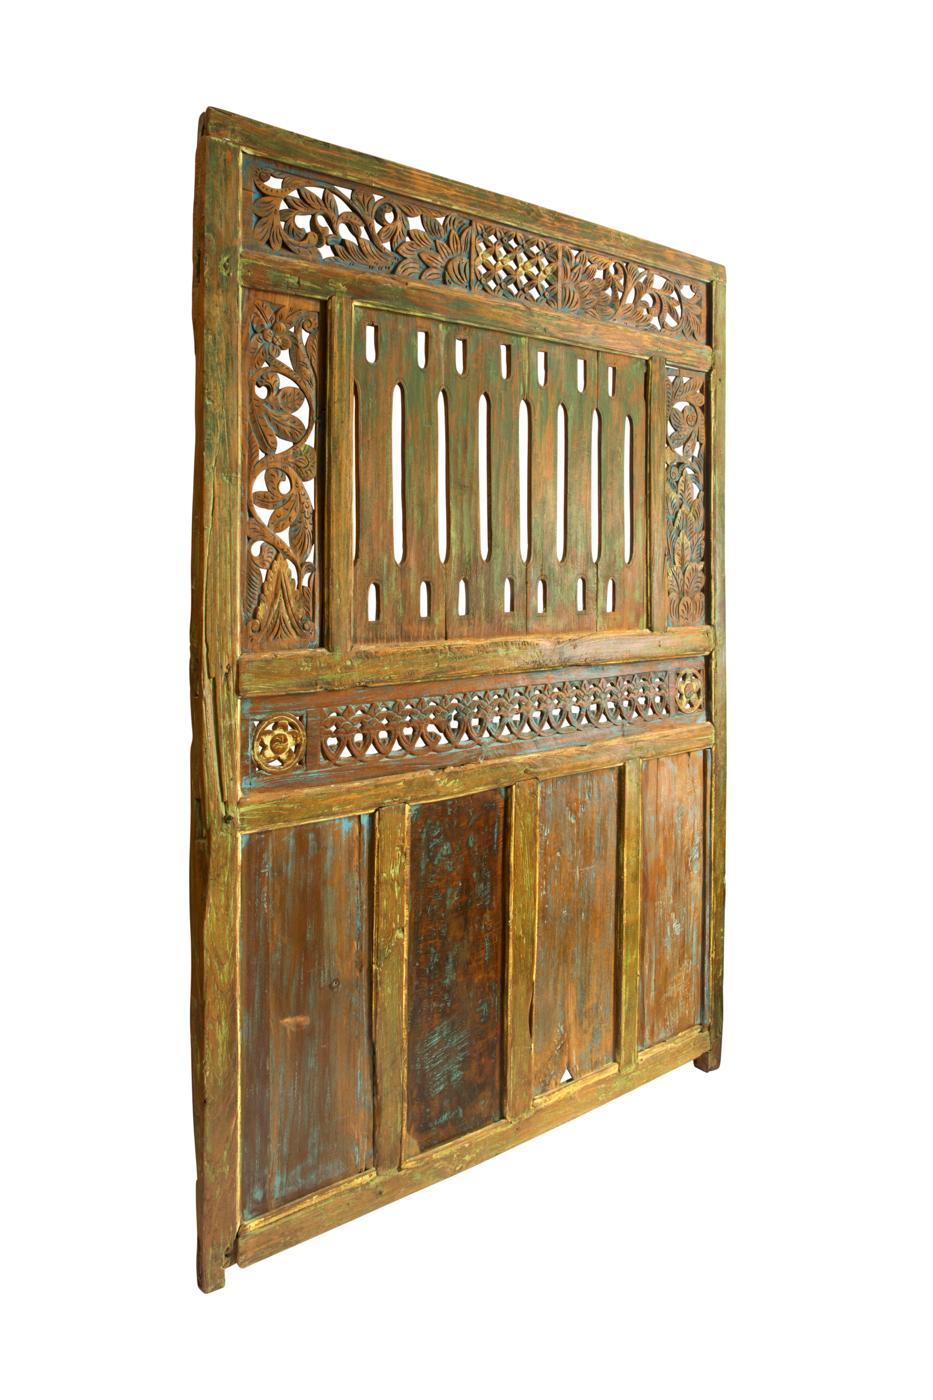 Puerta de madera tallado rombo